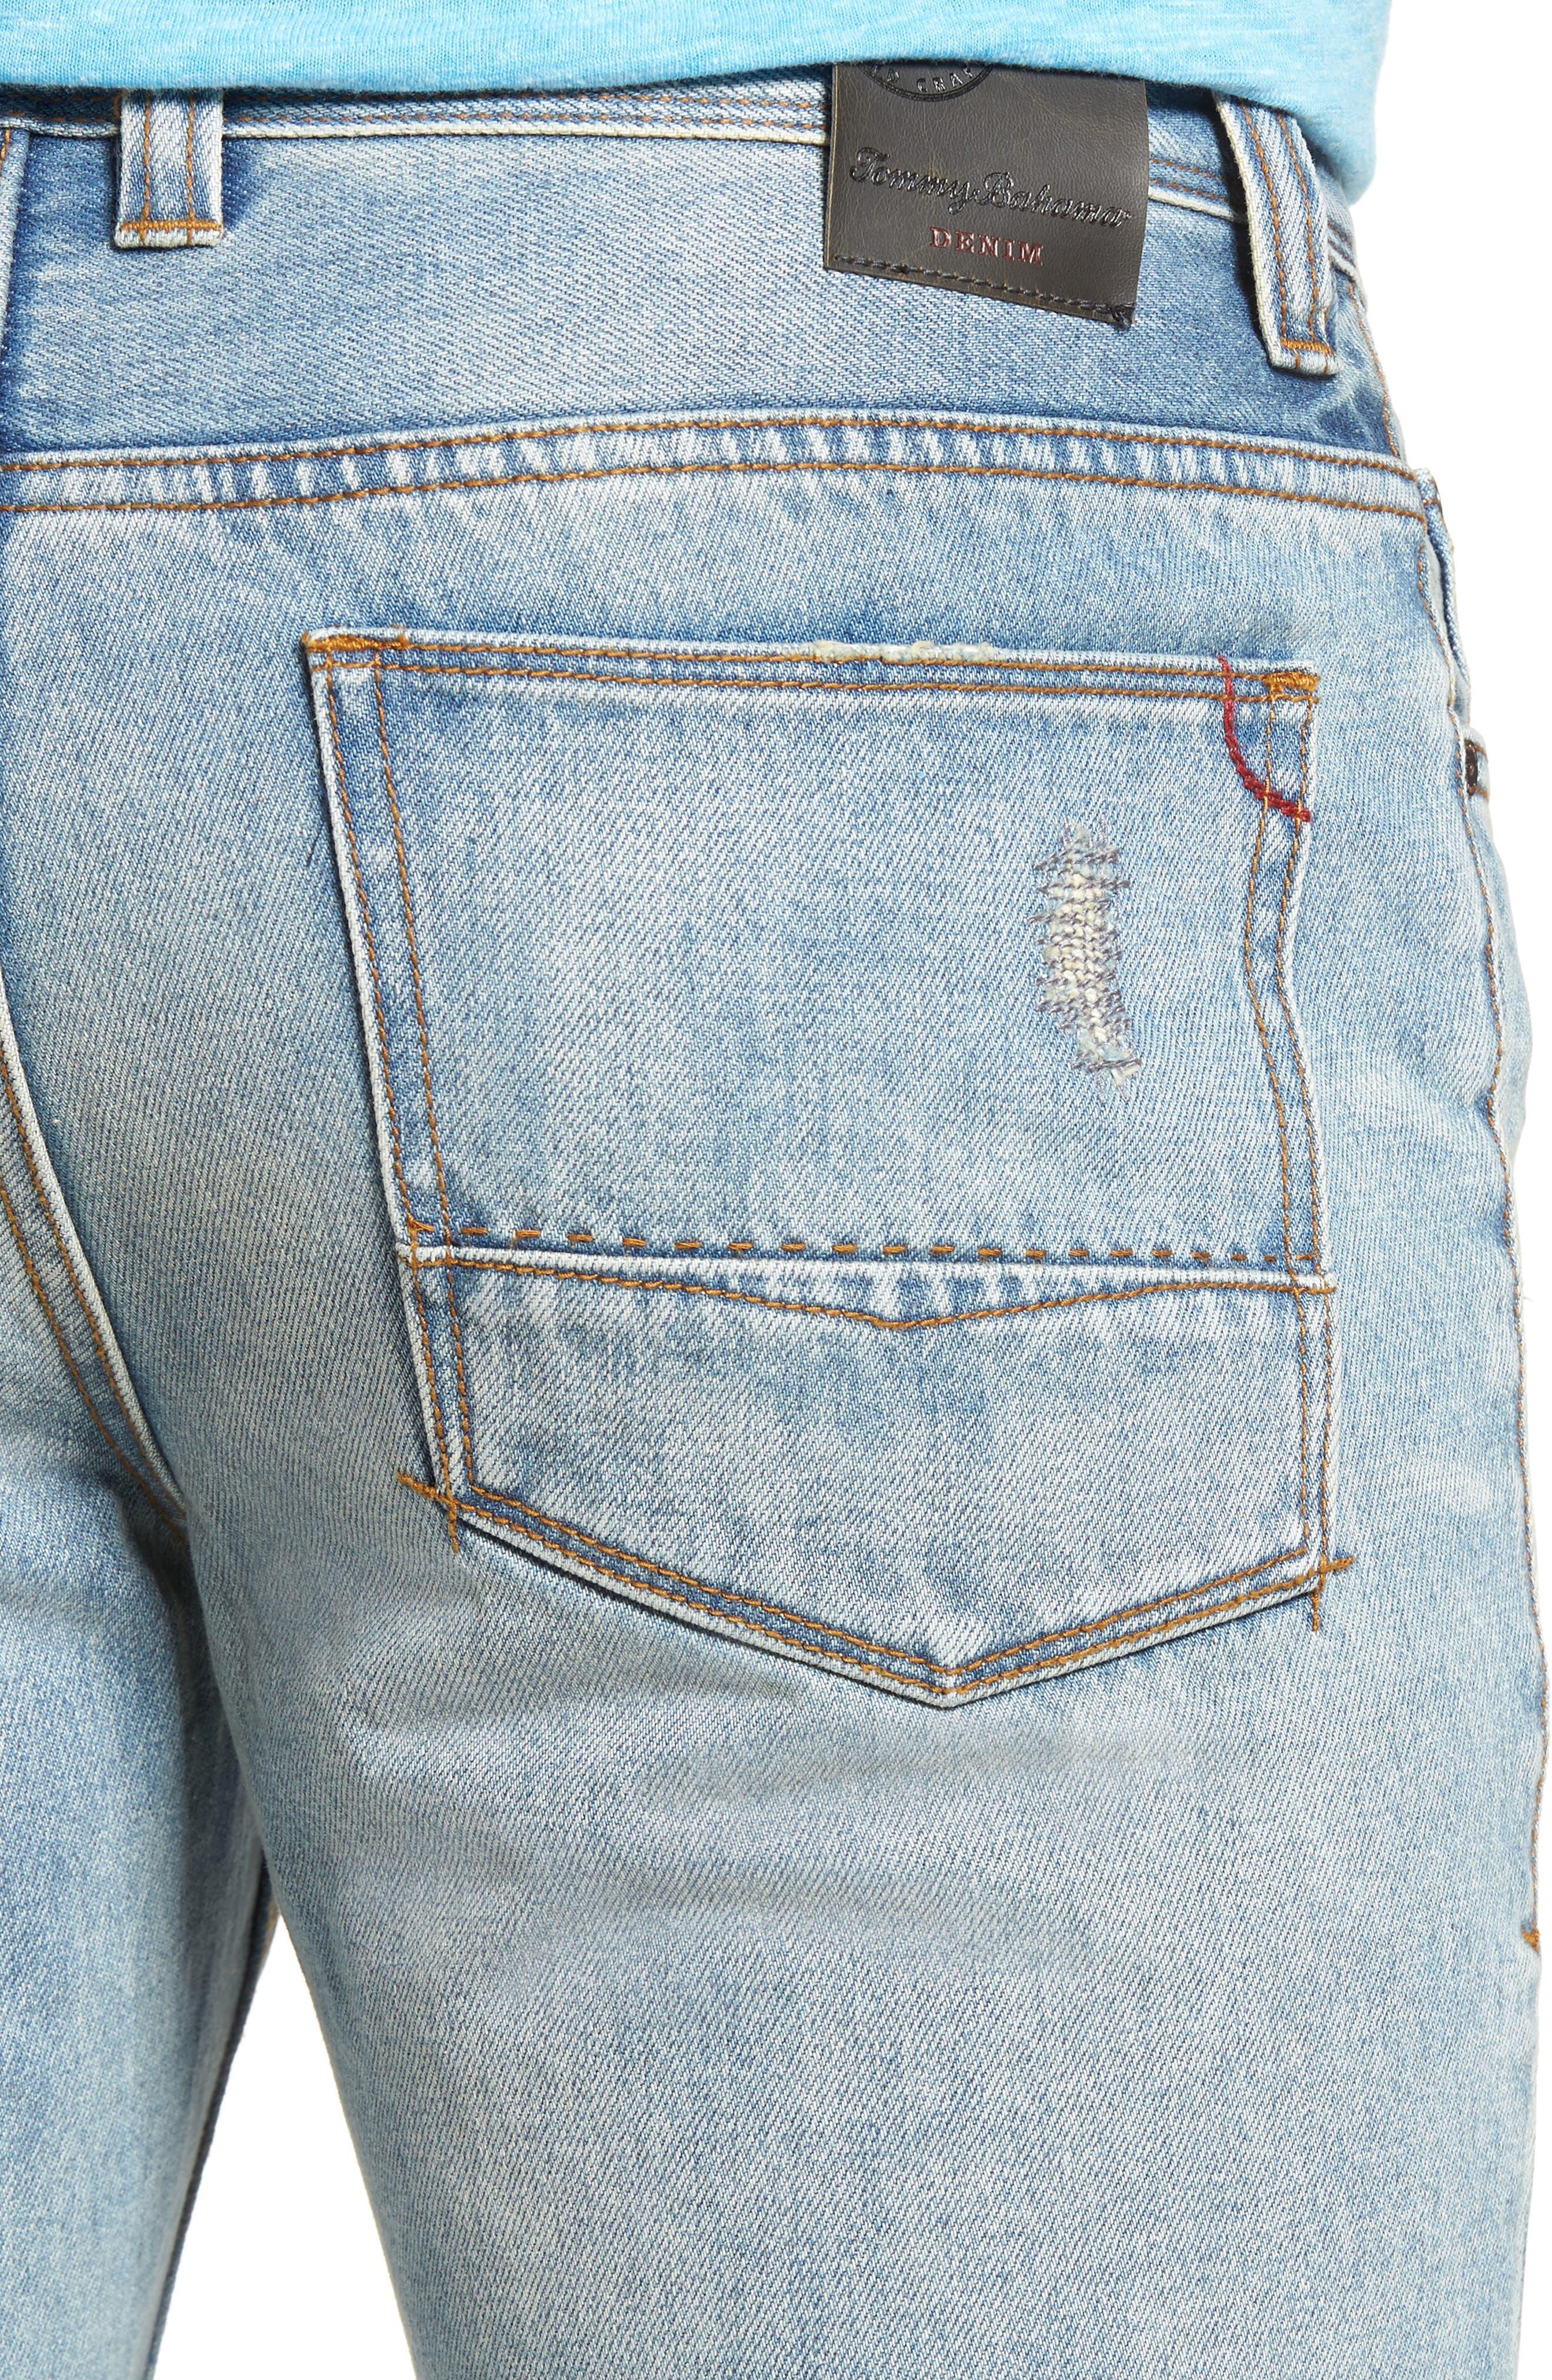 Castaway Slim Fit Jeans,                             Alternate thumbnail 4, color,                             Bleached Vintage Wash